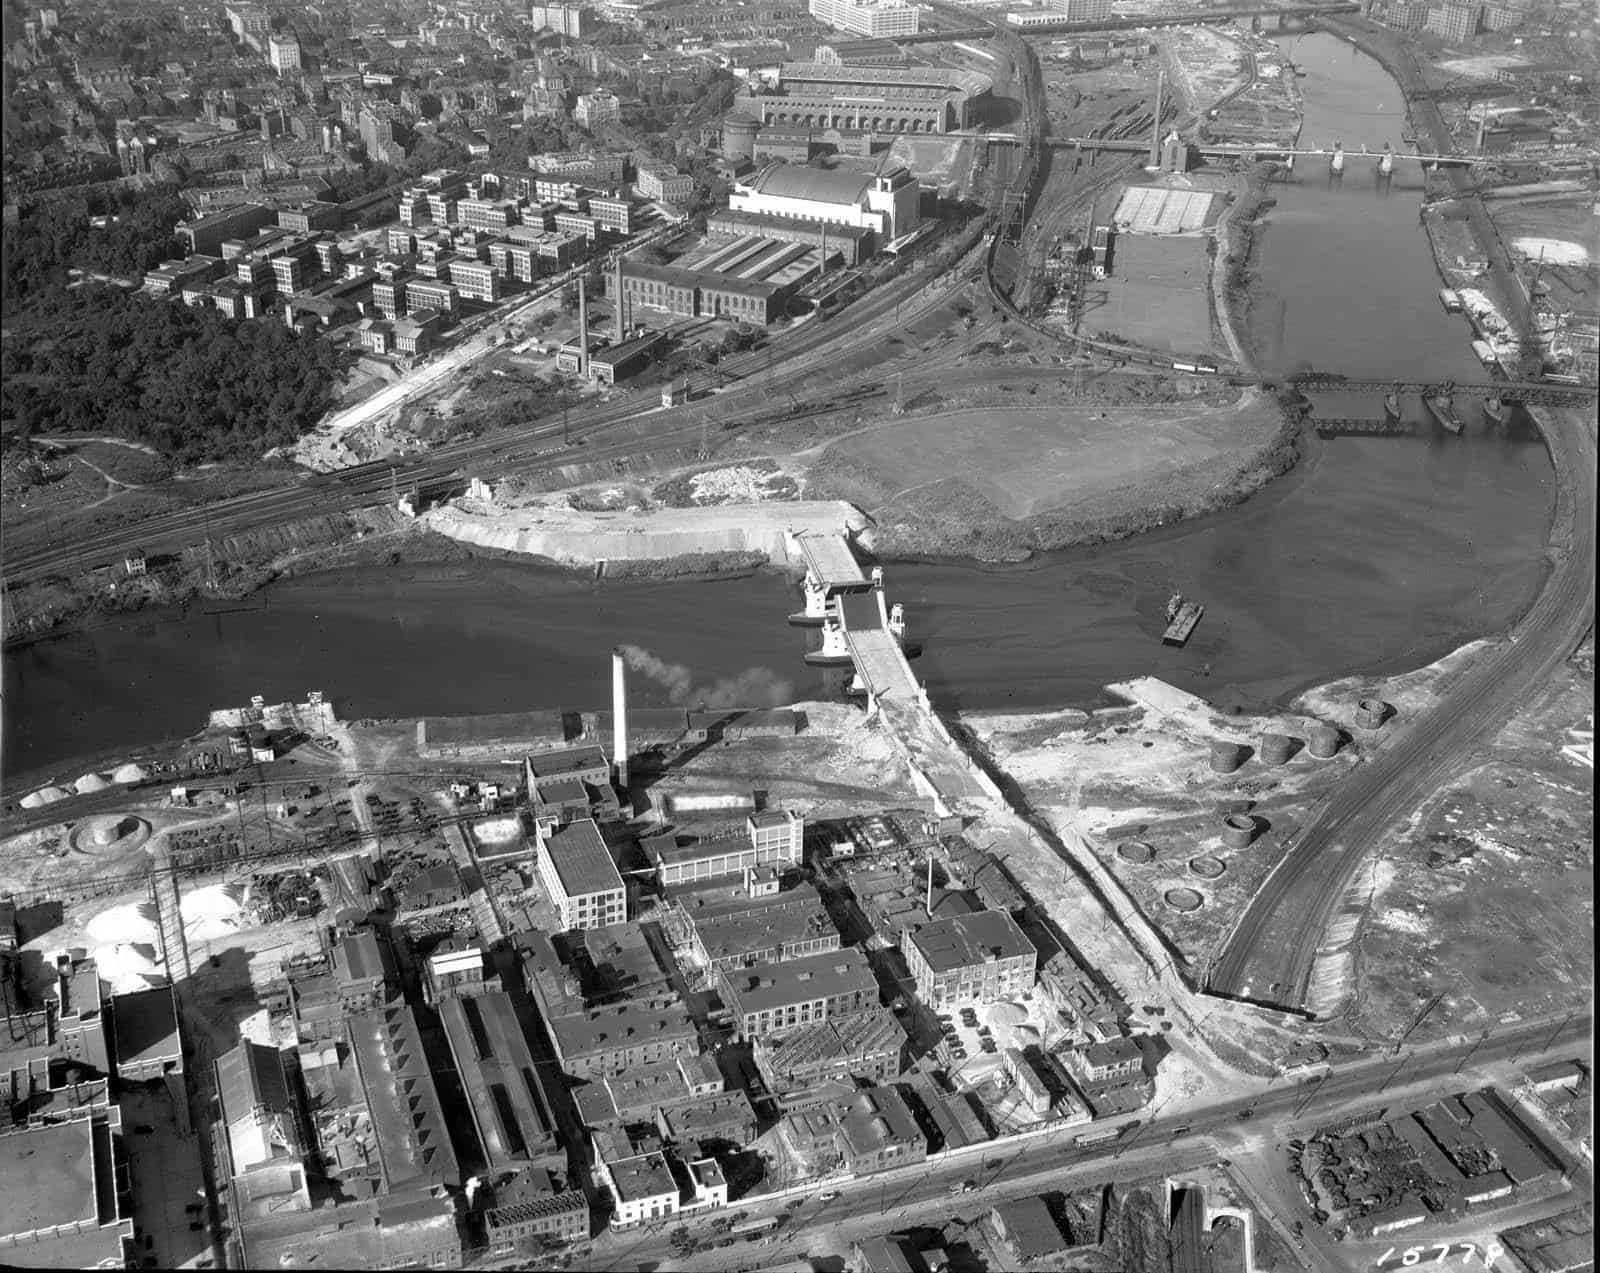 University Avenue Bridge under construction, connecting the Grays Ferry and West Philadelphia neighborhoods, Philadelphia. 1932.